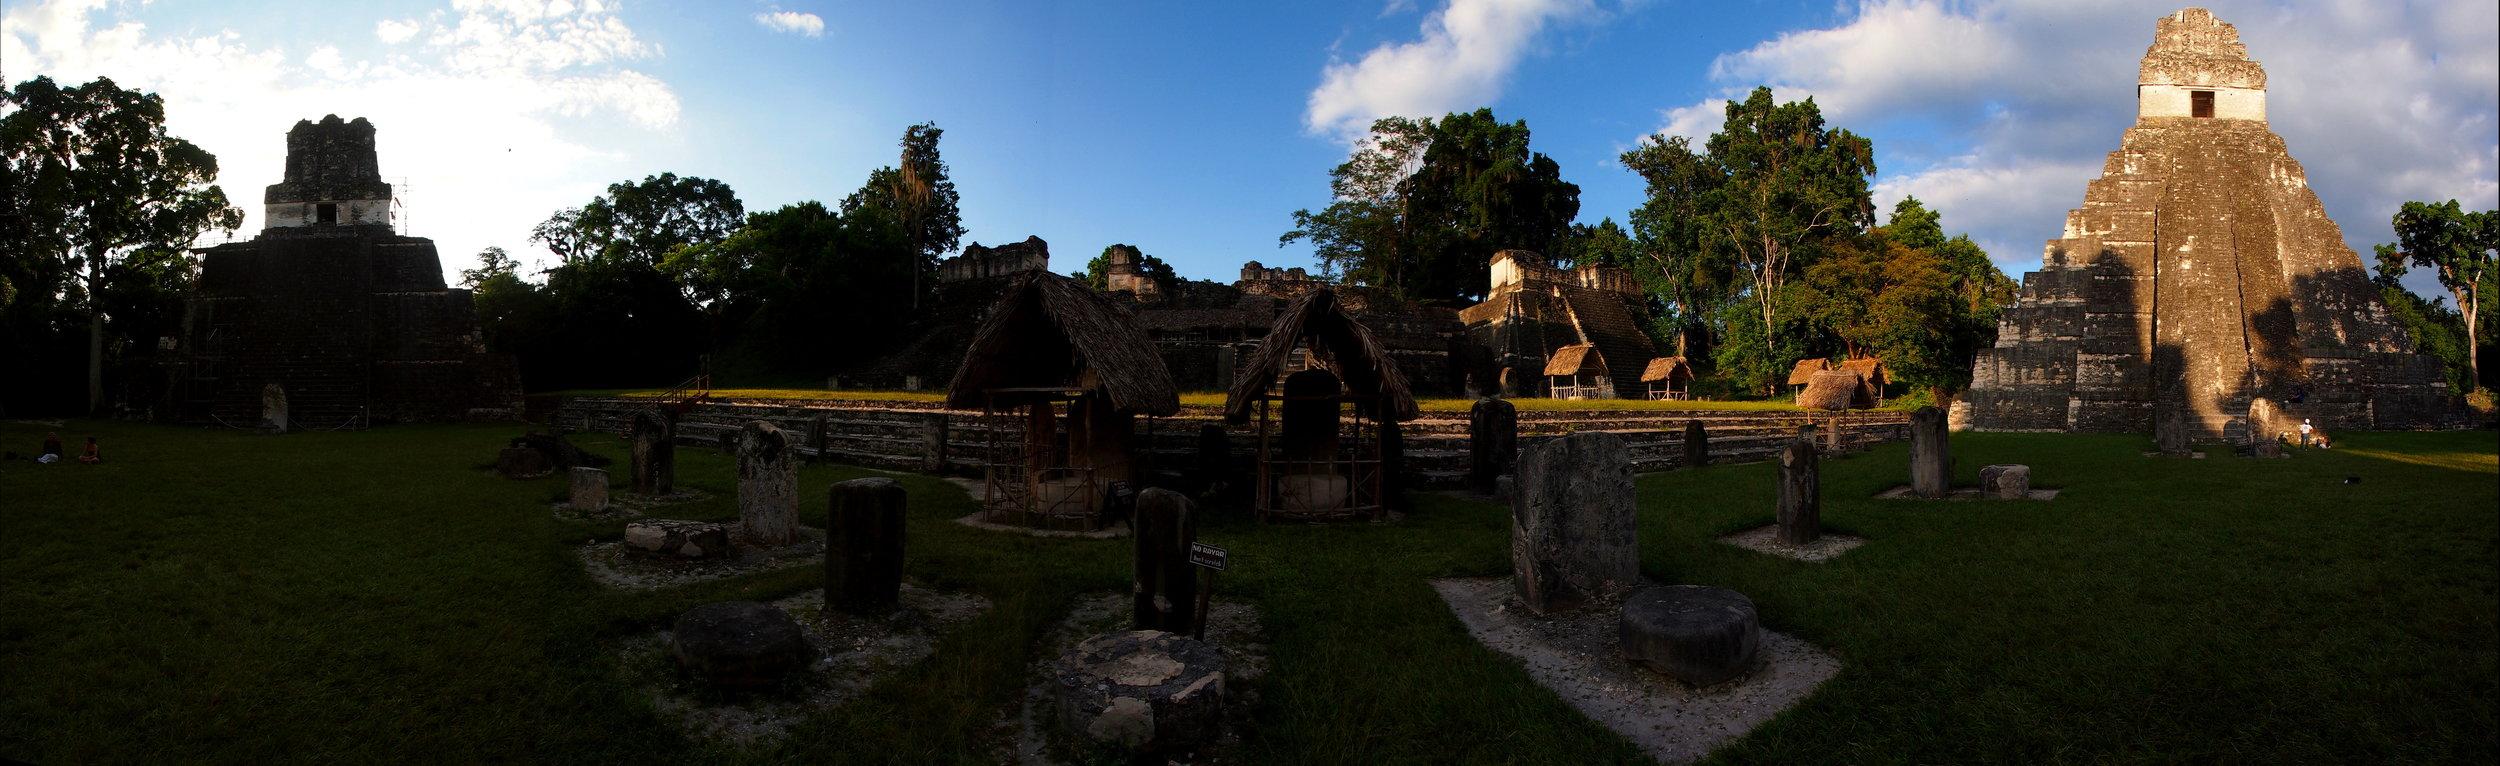 Tikal Temples of Chocolate man & his wife.jpg